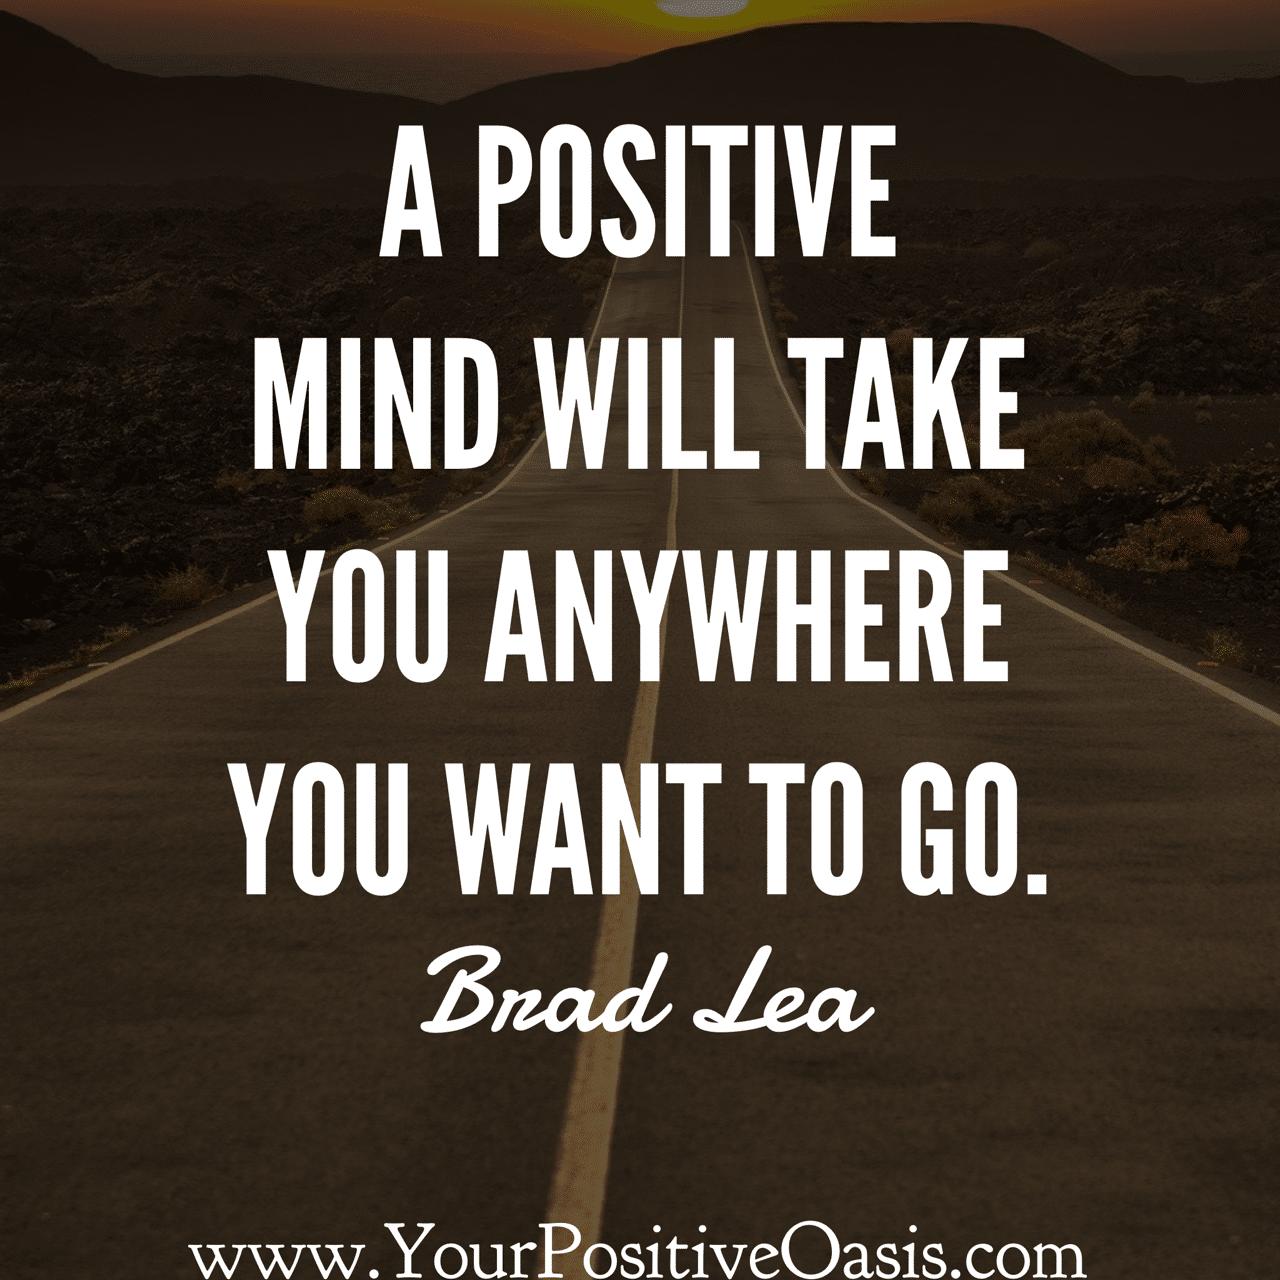 25 Inspirational Brad Lea Quotes